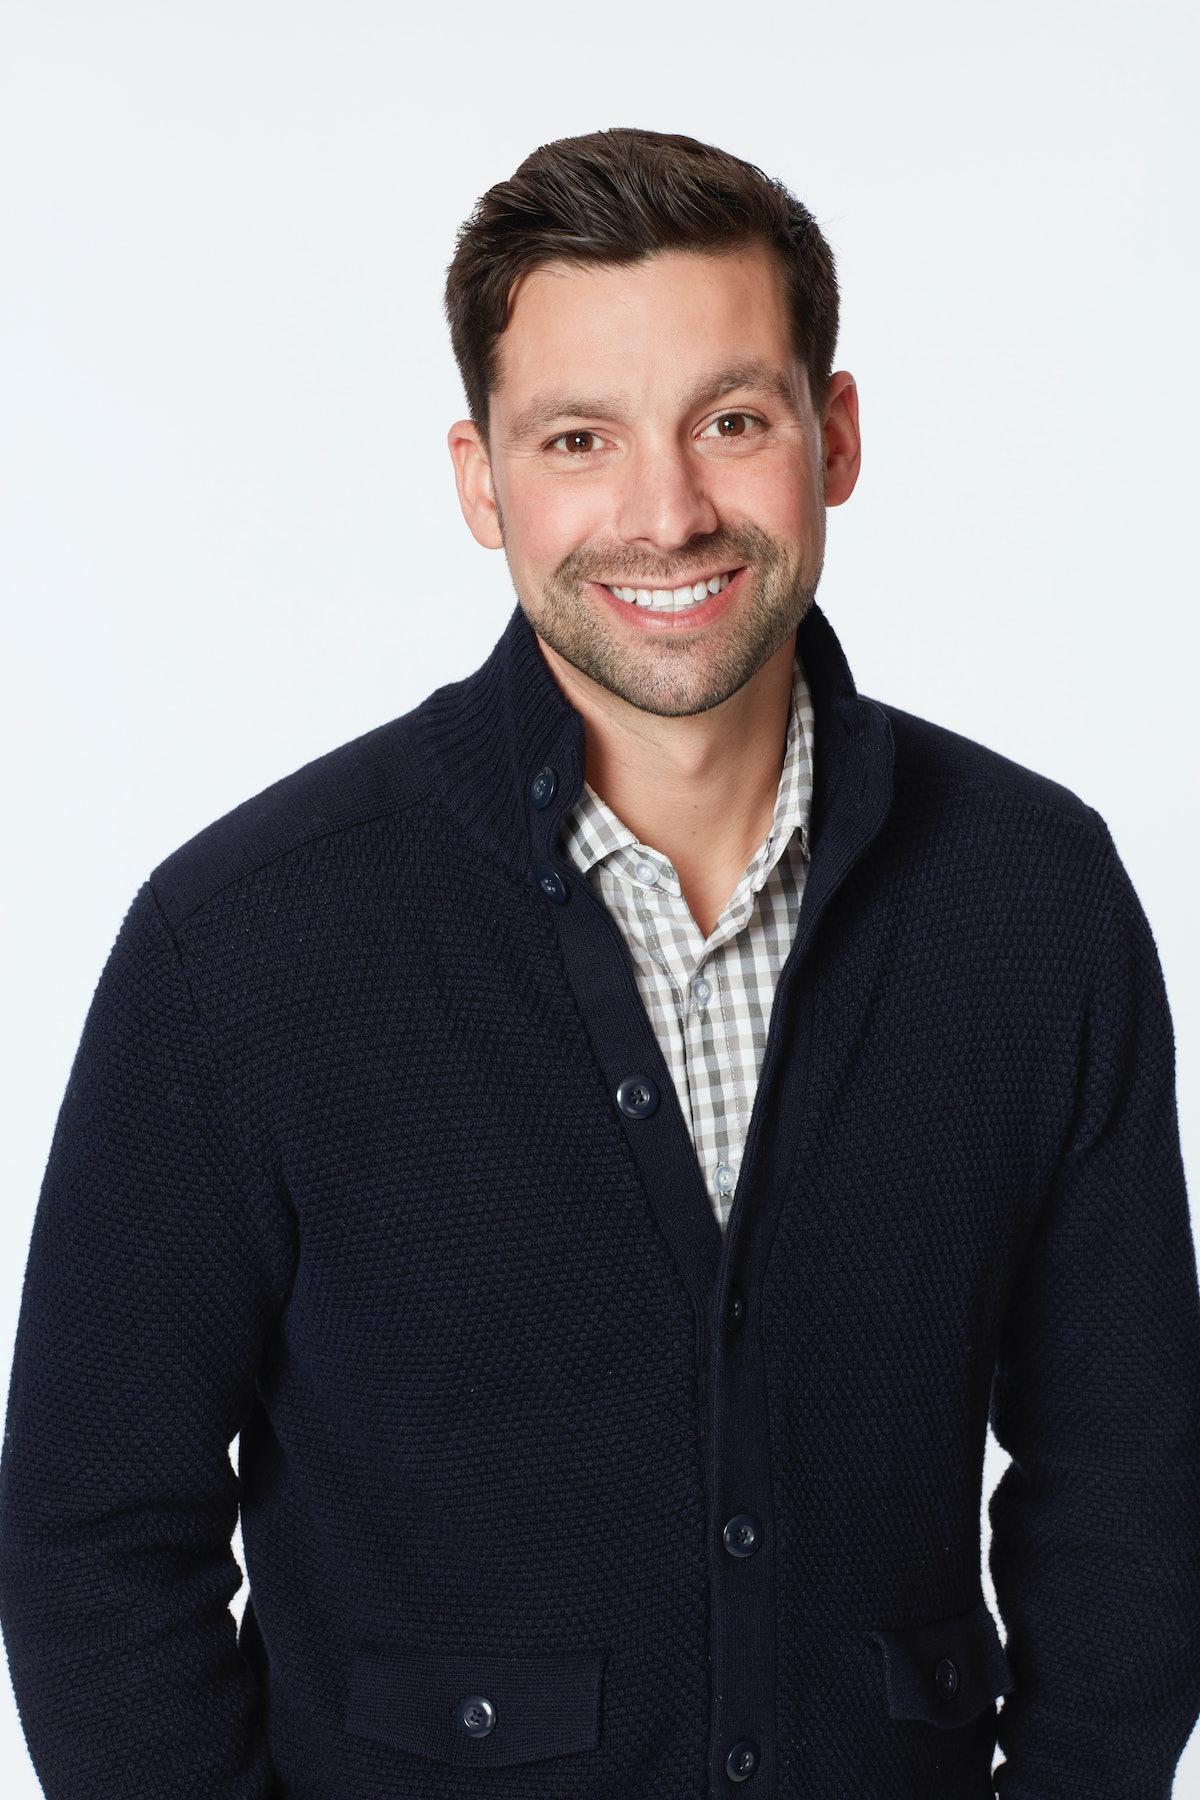 Michael Allio from Katie Thurston's 'Bachelorette' cast